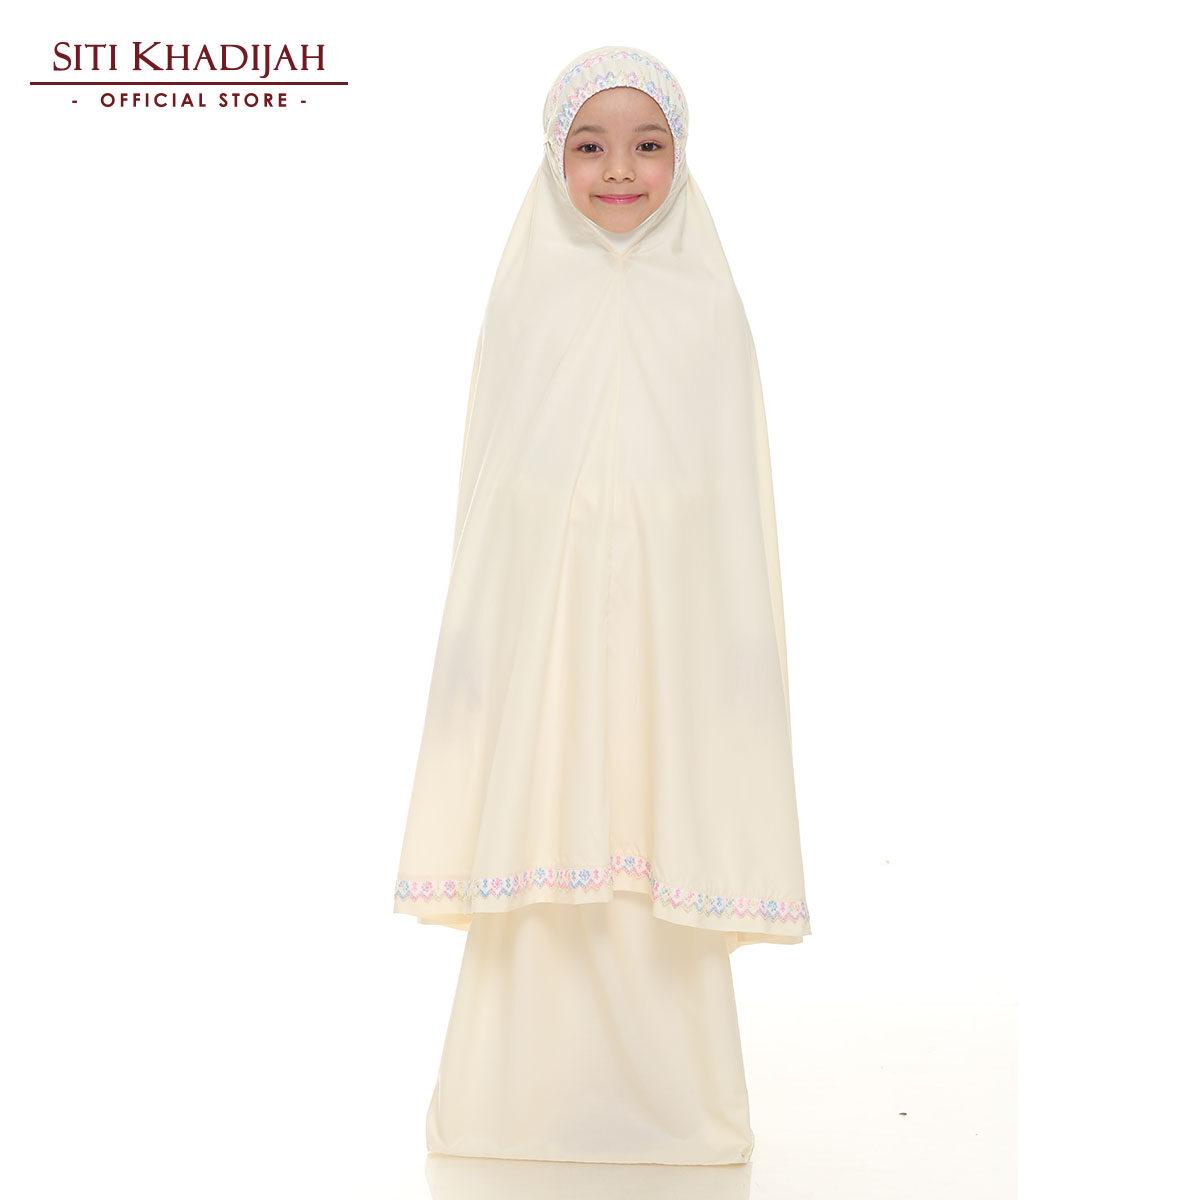 Siti Khadijah Telekung Kids Samira in Soft Yellow